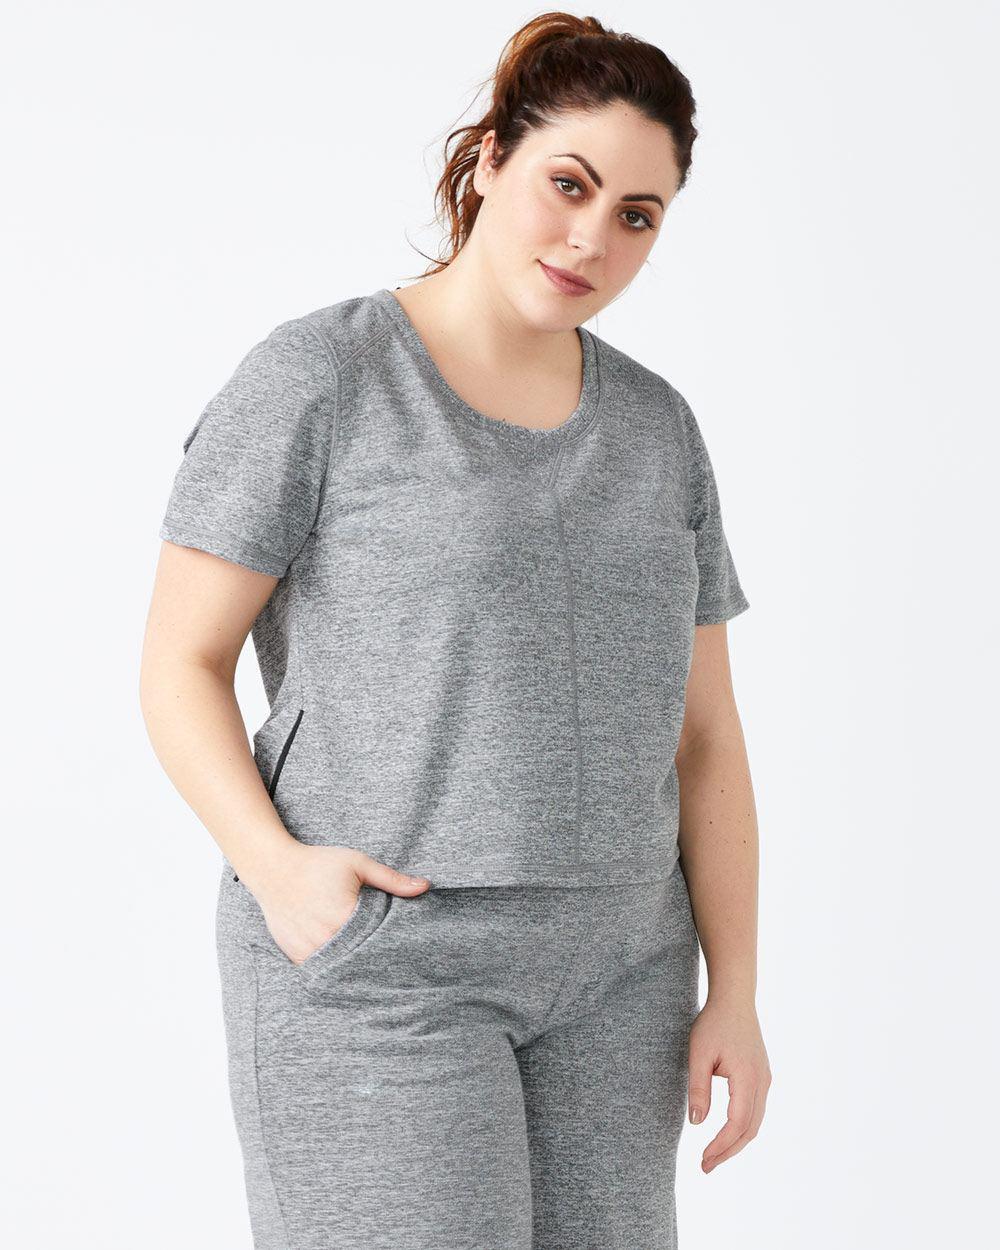 fe2c62b26af66 Lyst - Addition Elle Athleisure - Plus-size Crop Top in Gray